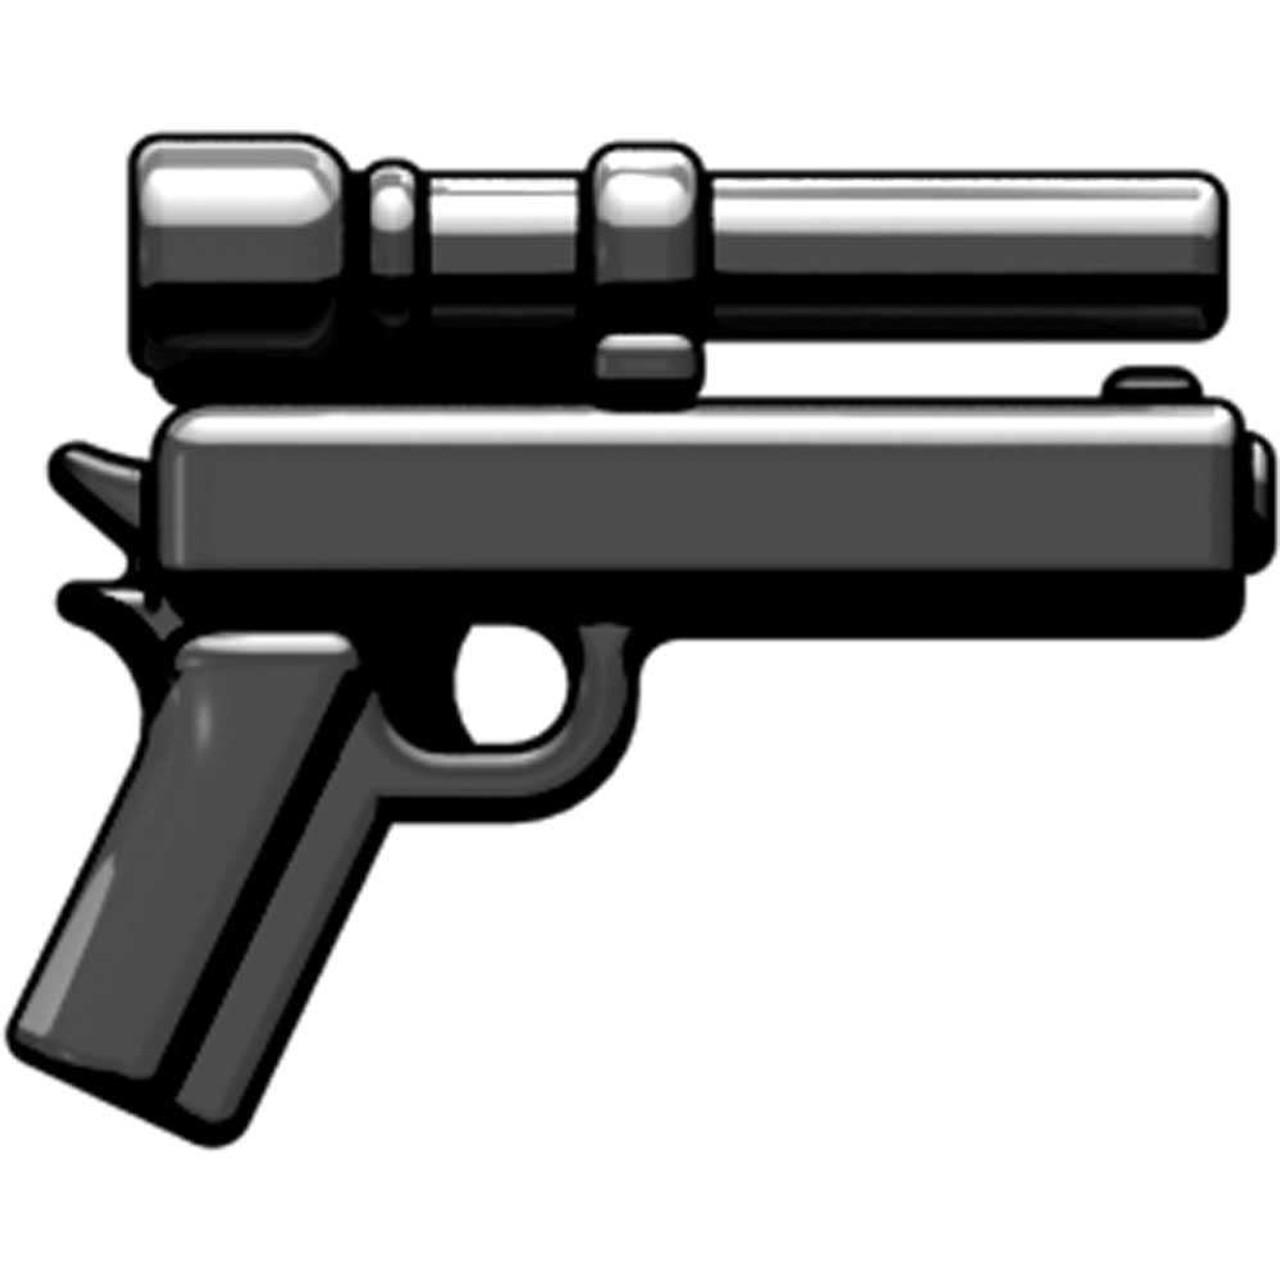 BrickArms Weapons Longslide 2.5-Inch [Black]